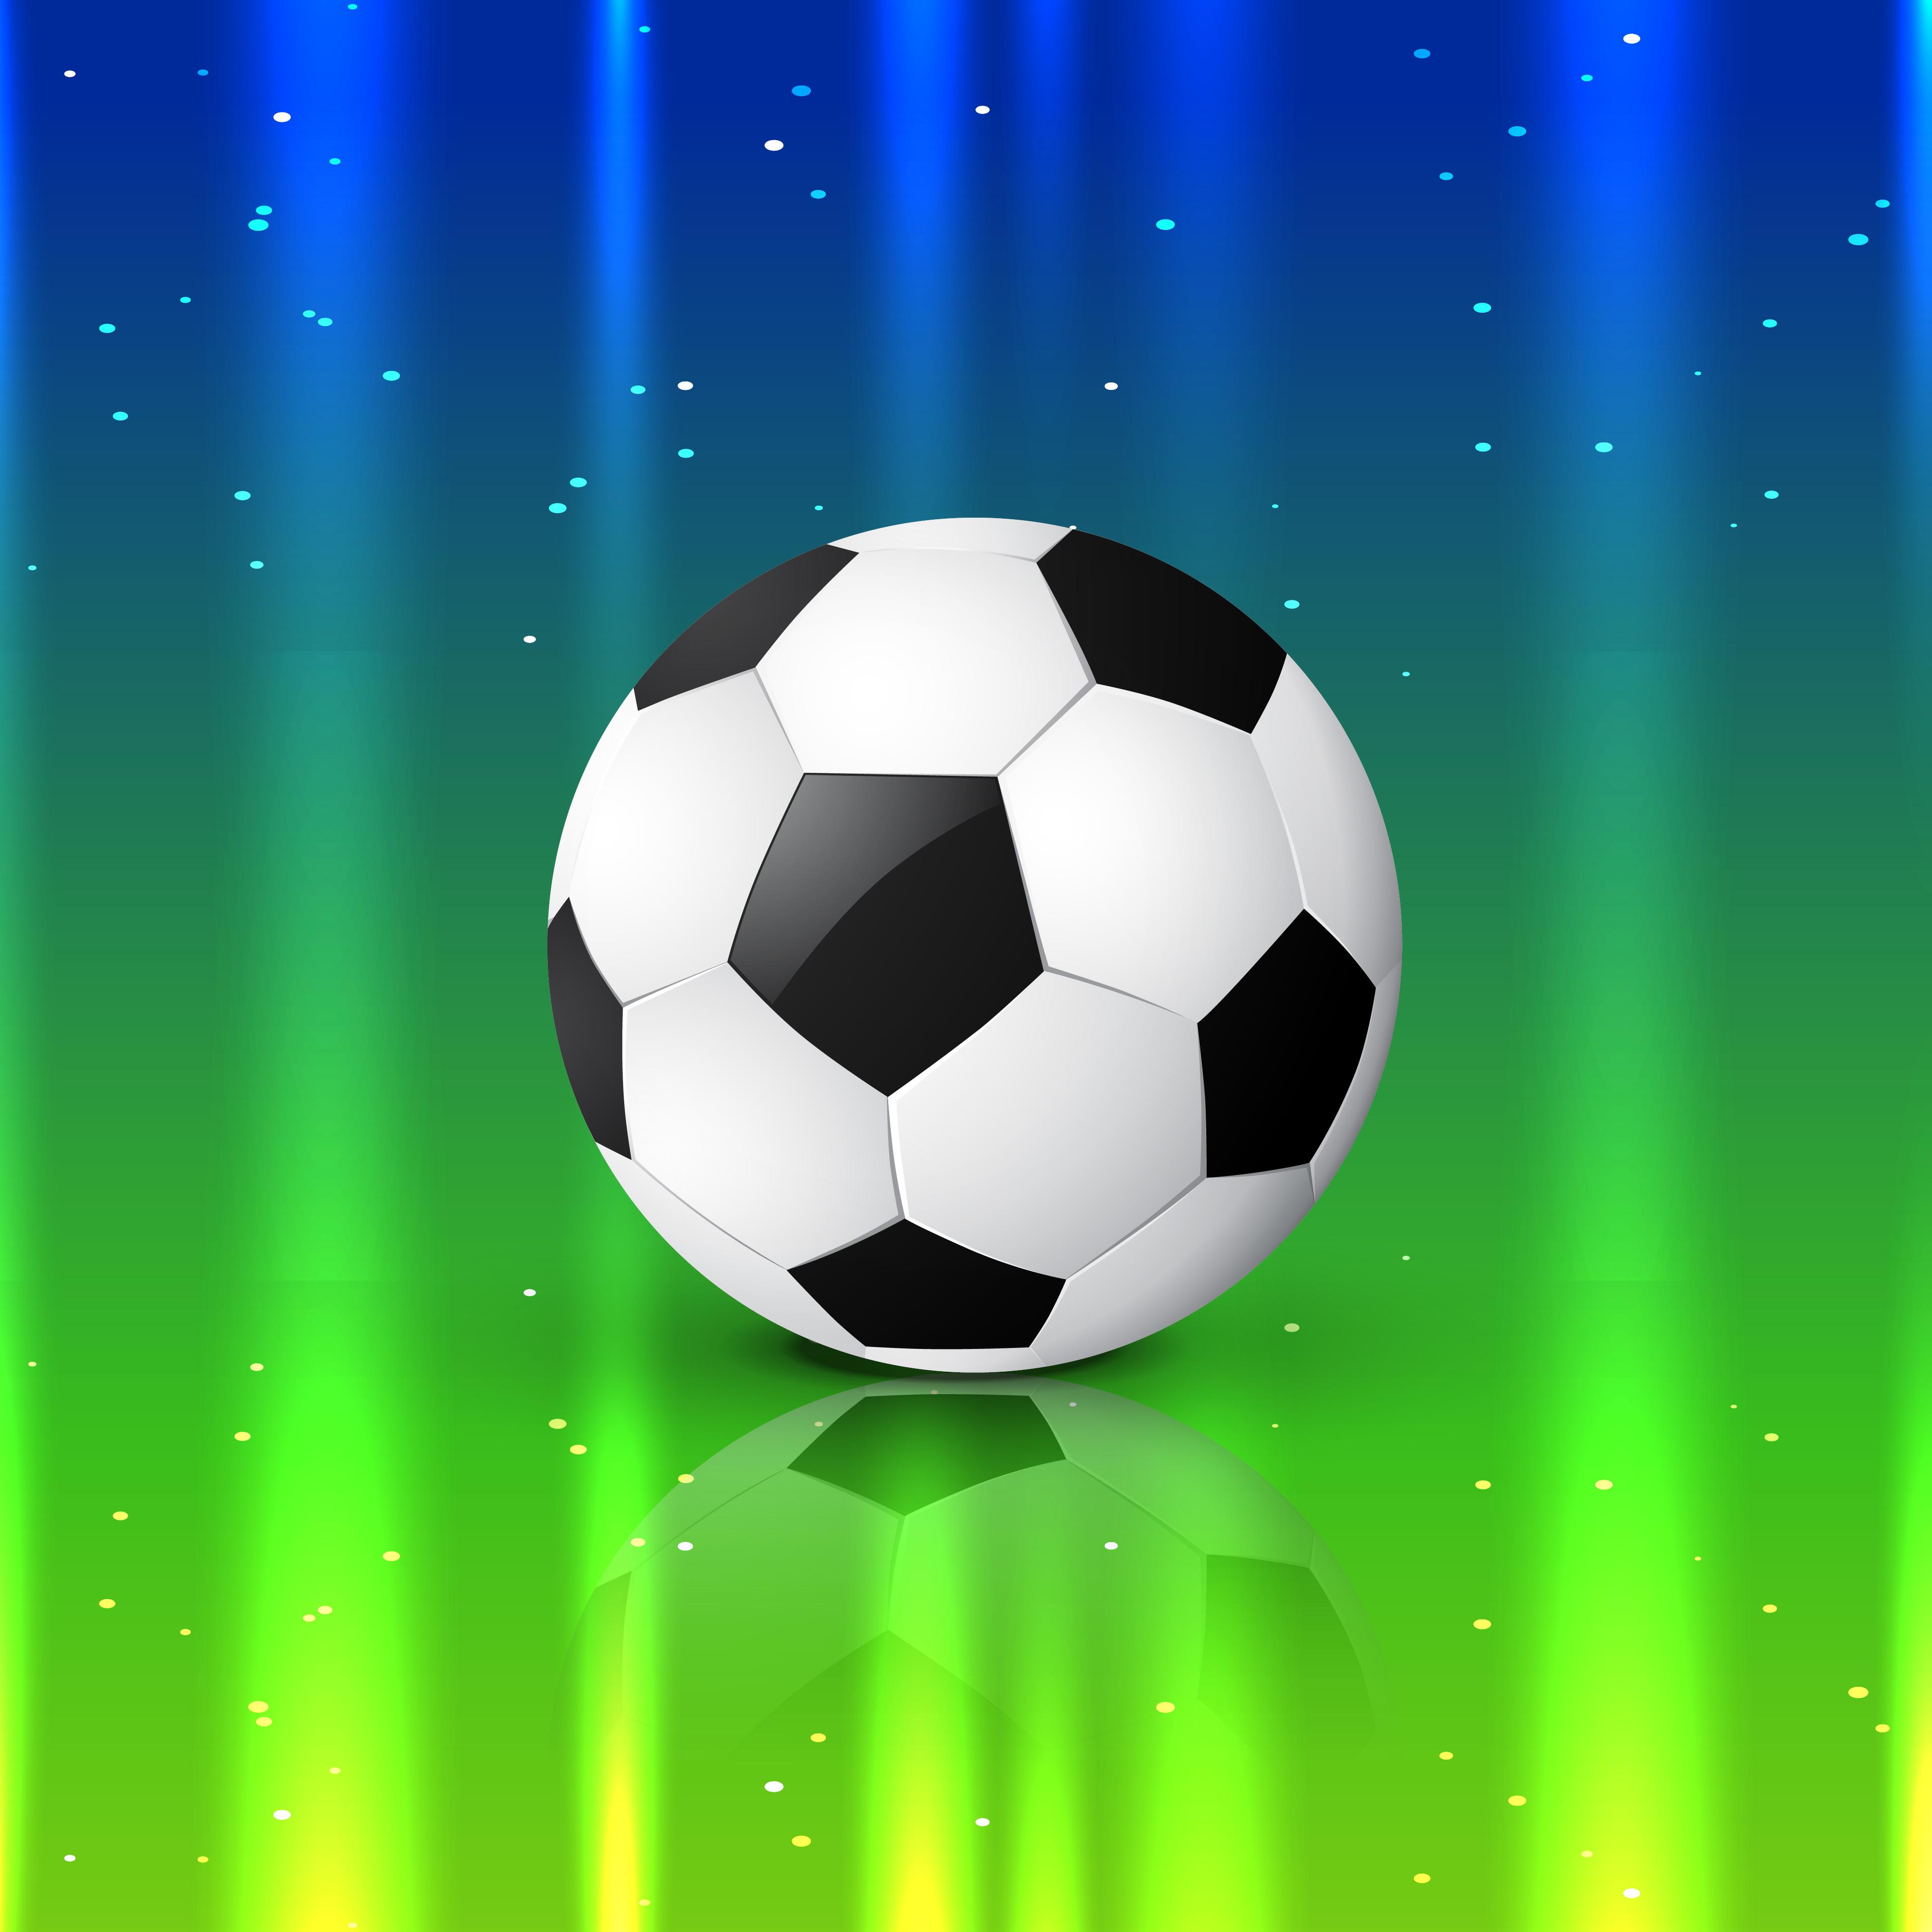 Beautiful Football Design Download Free Vector Art